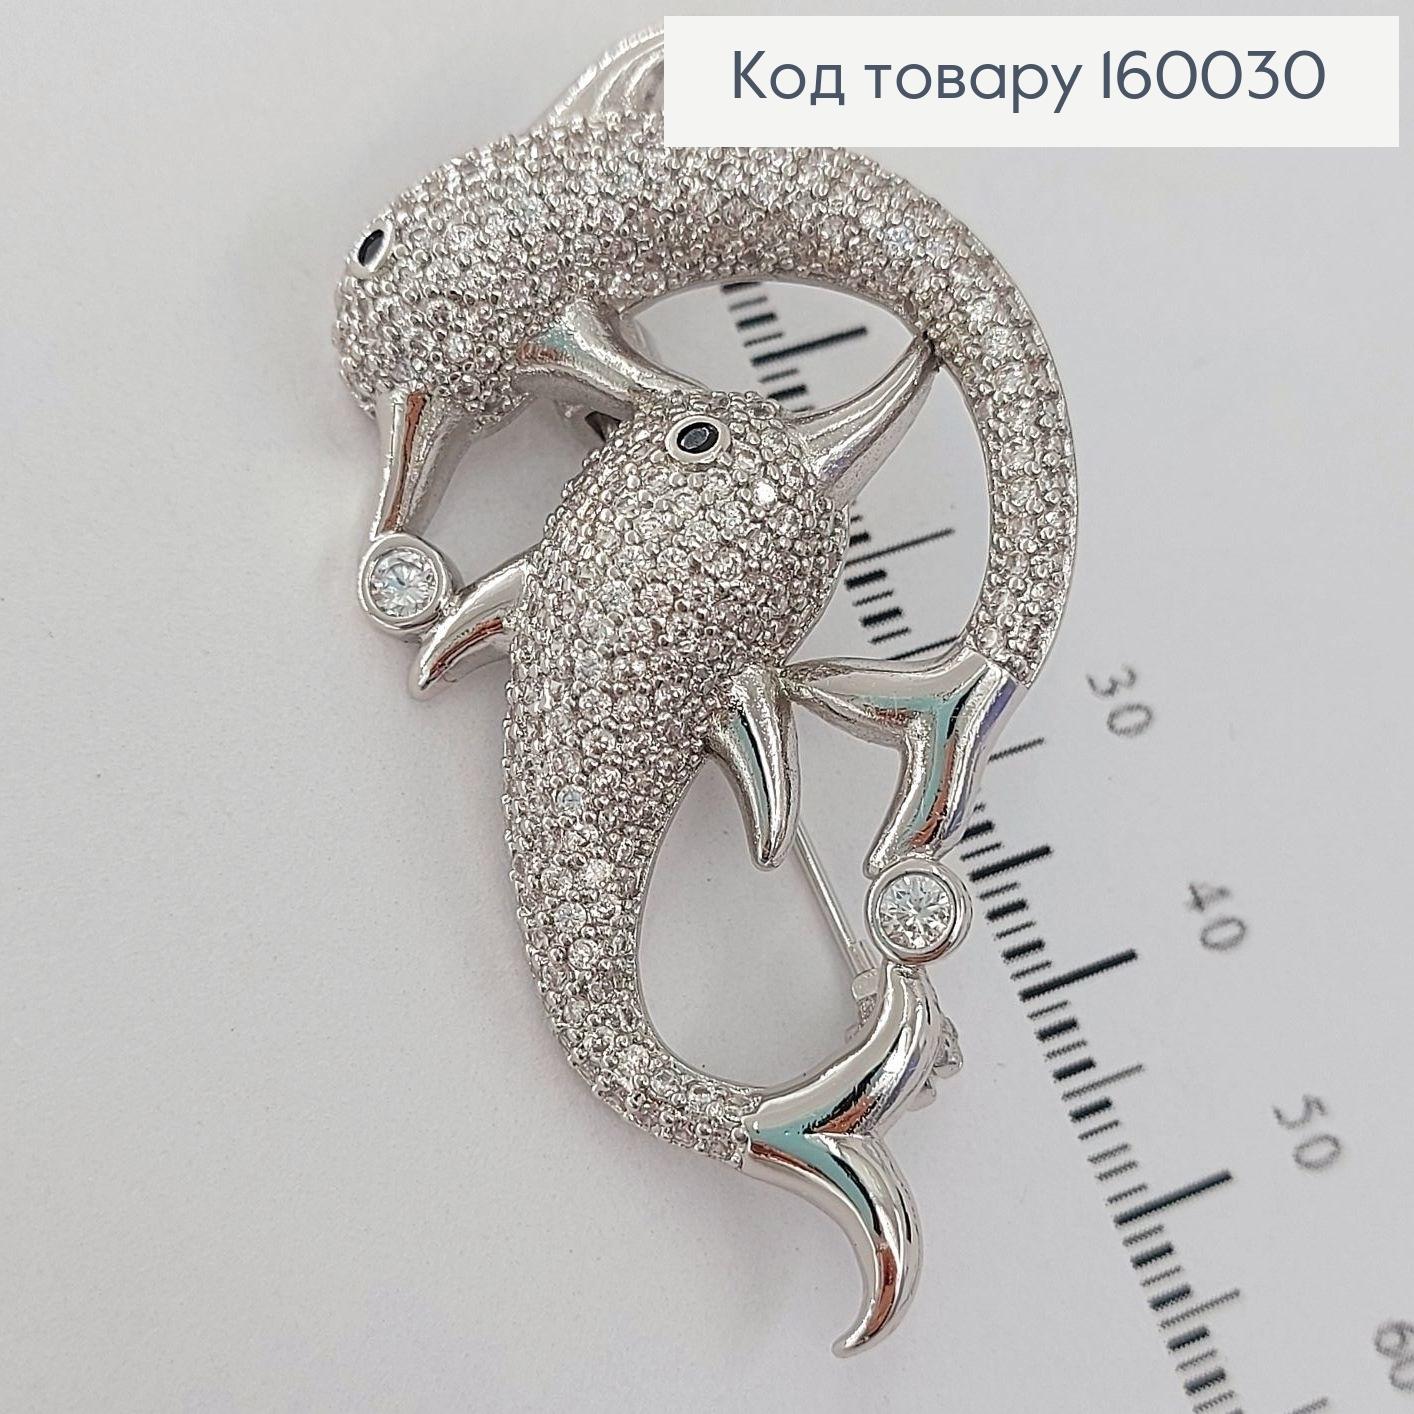 Брошка Дельфіни   в камінцях медичне золото  Xuping 18к 160030 фото 2